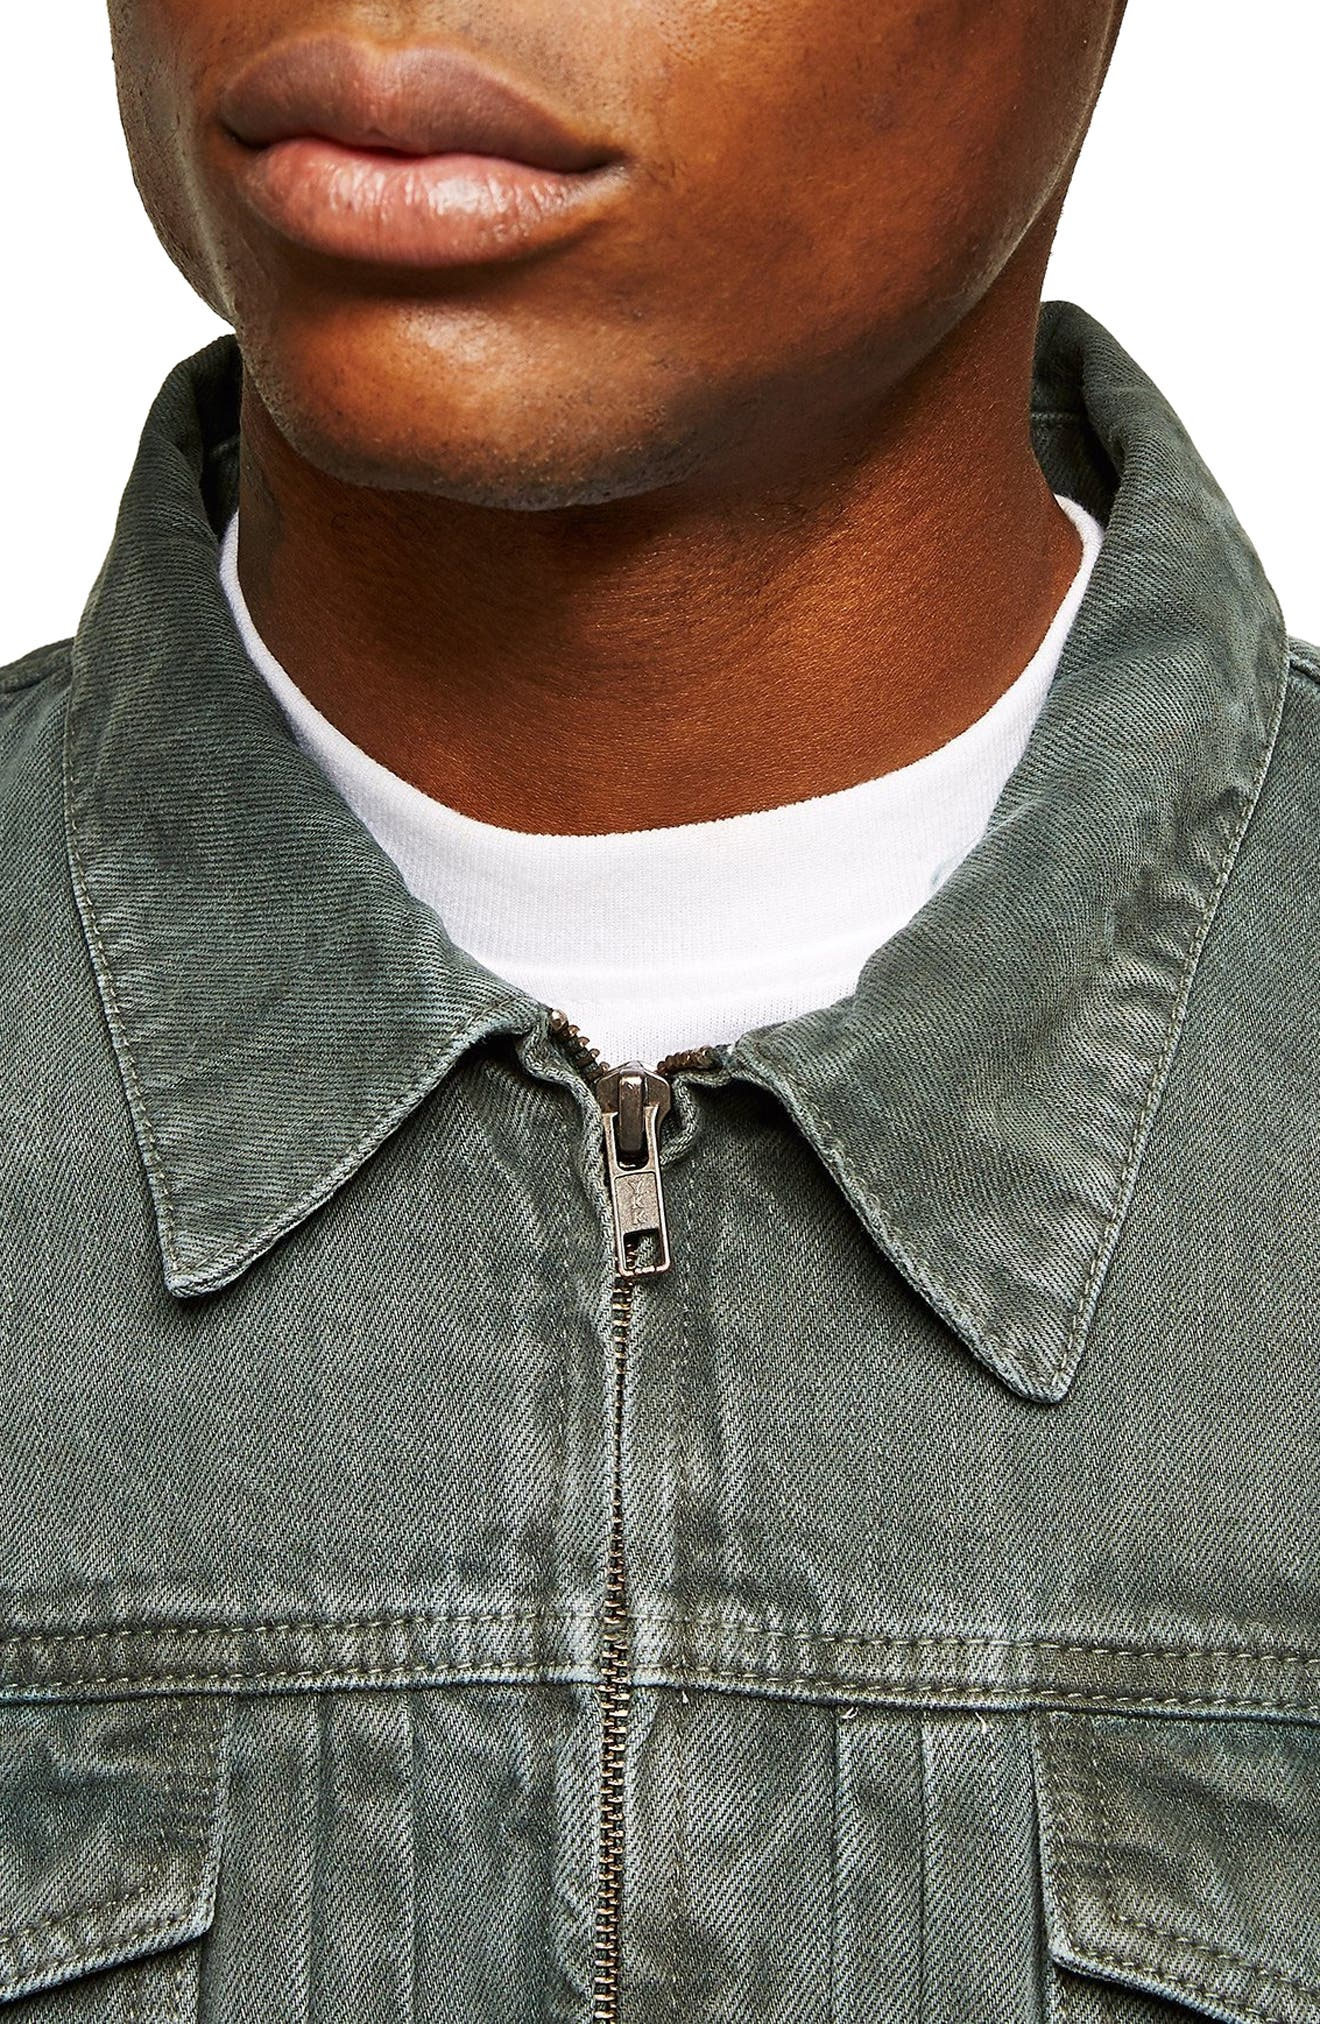 Zip Denim Jacket,                             Alternate thumbnail 3, color,                             330